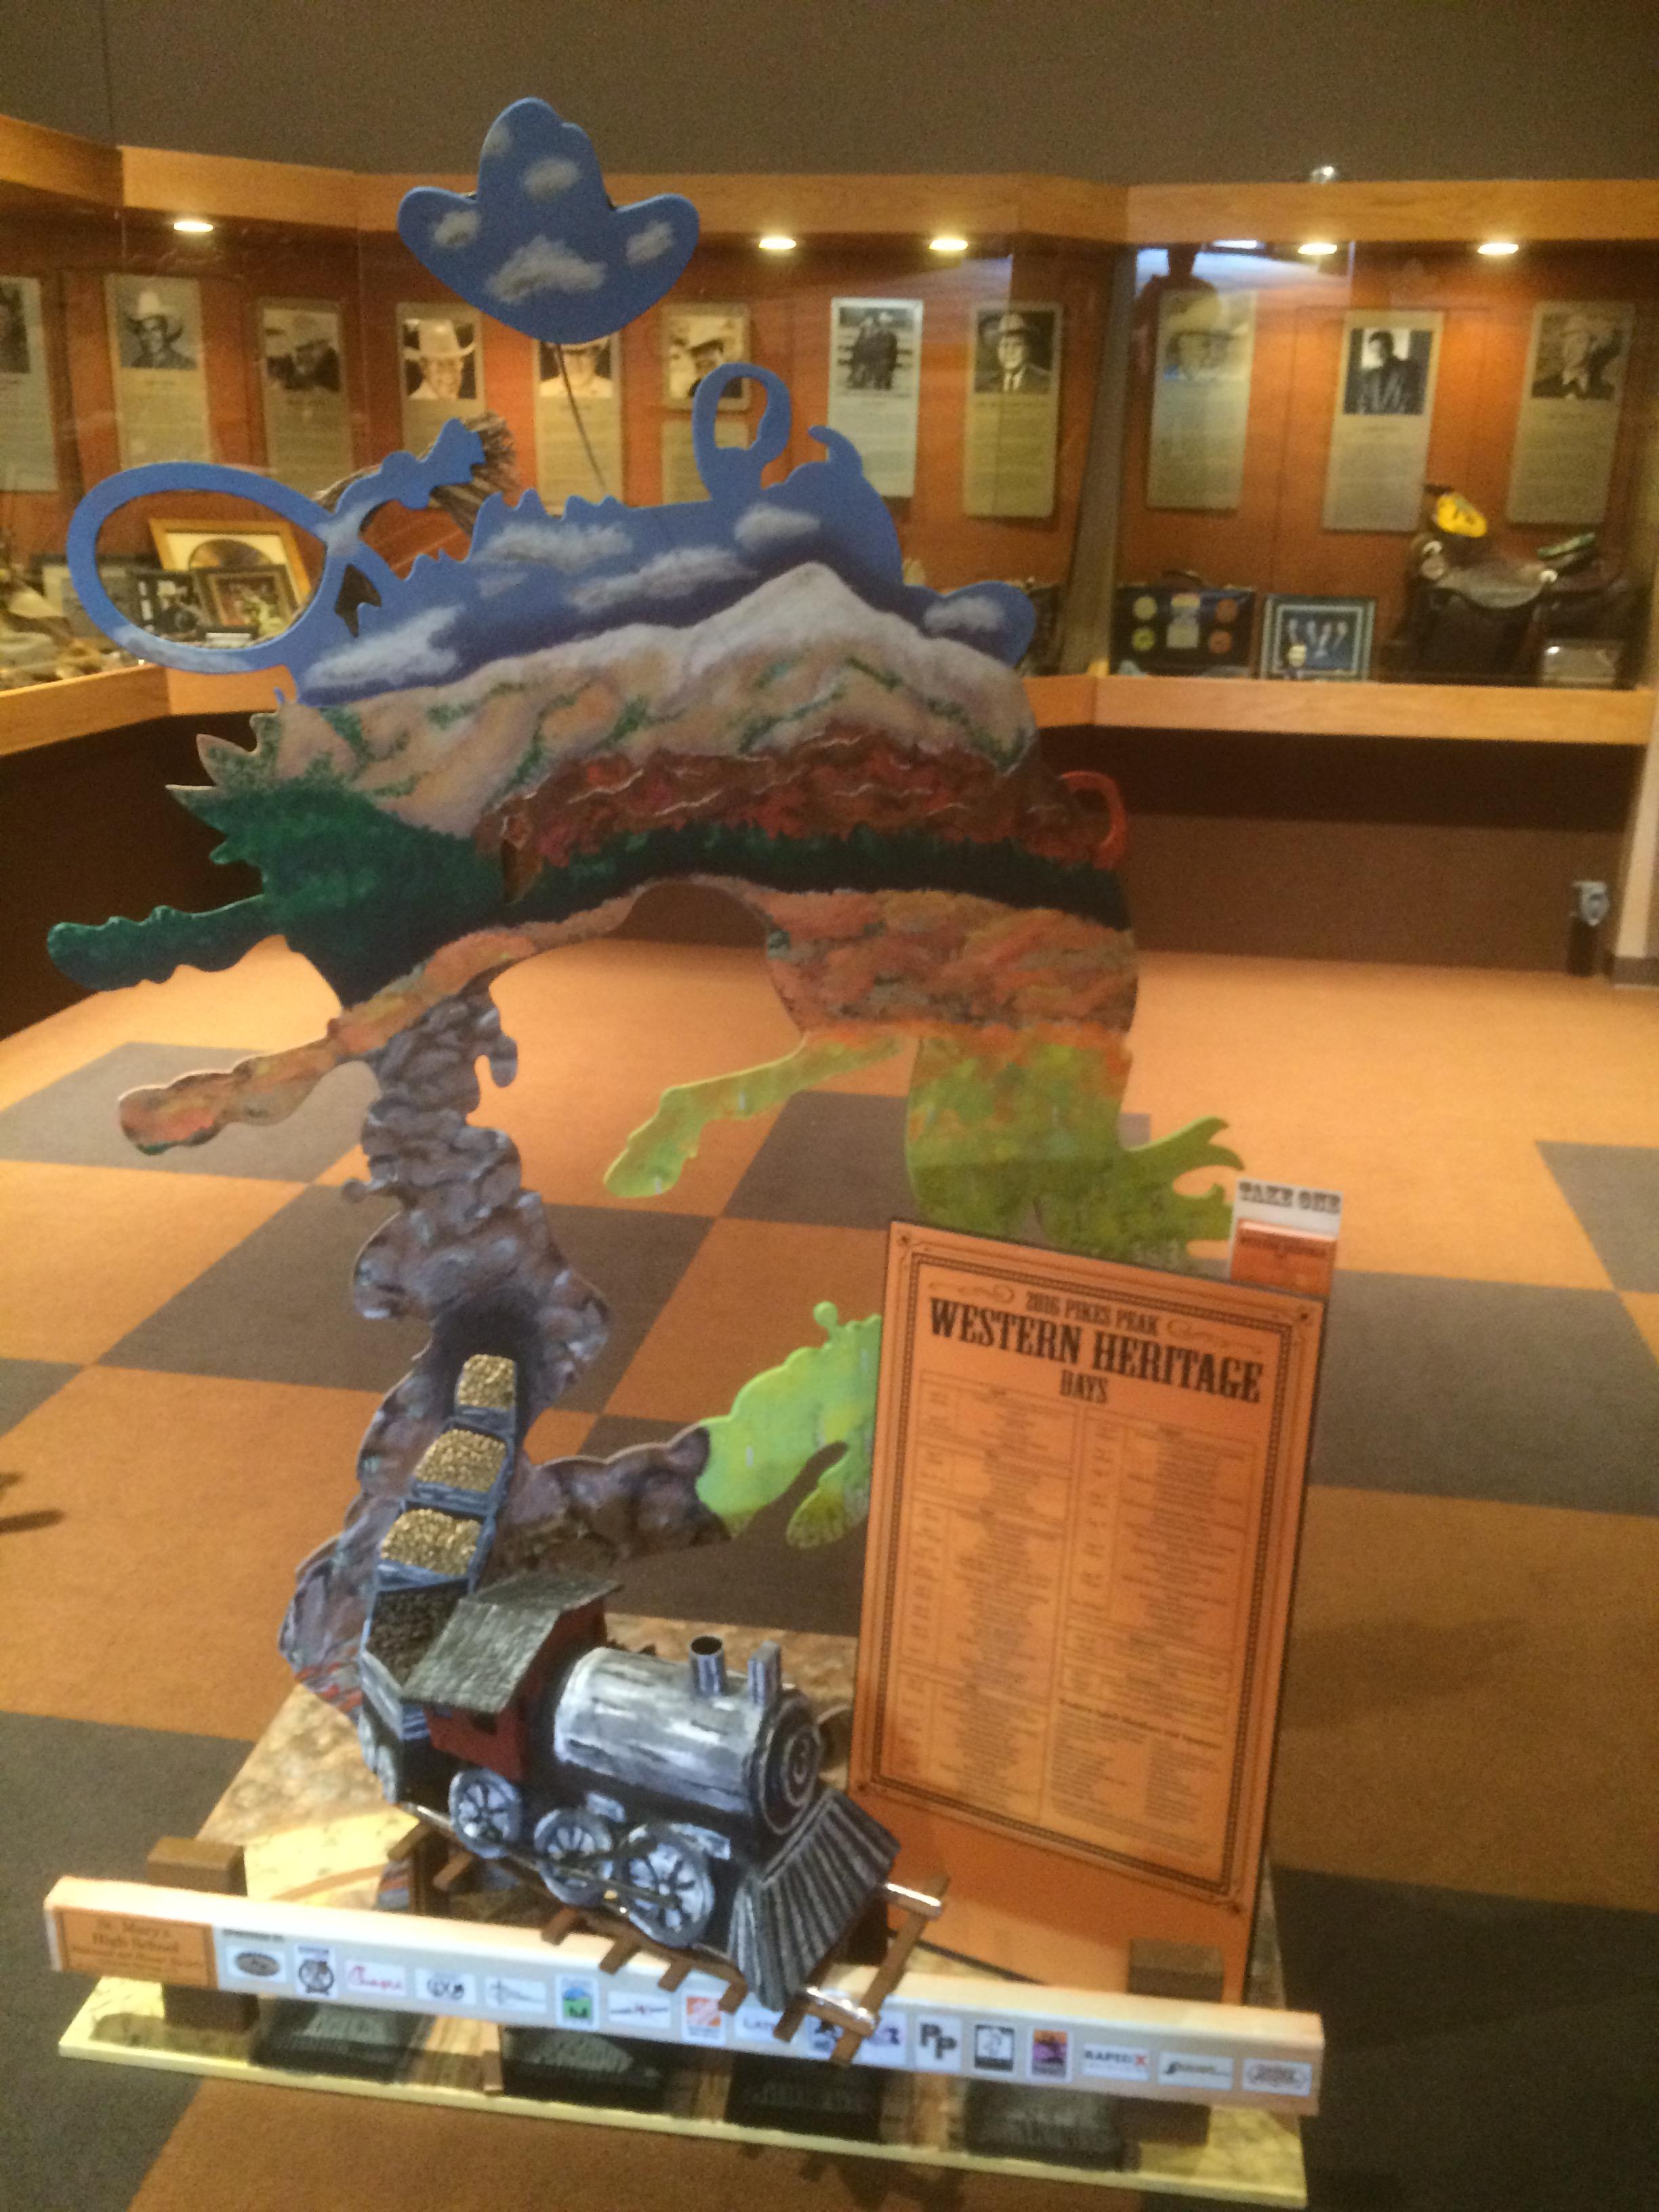 2016 Western Heritage Spirit Of Colorado Springs